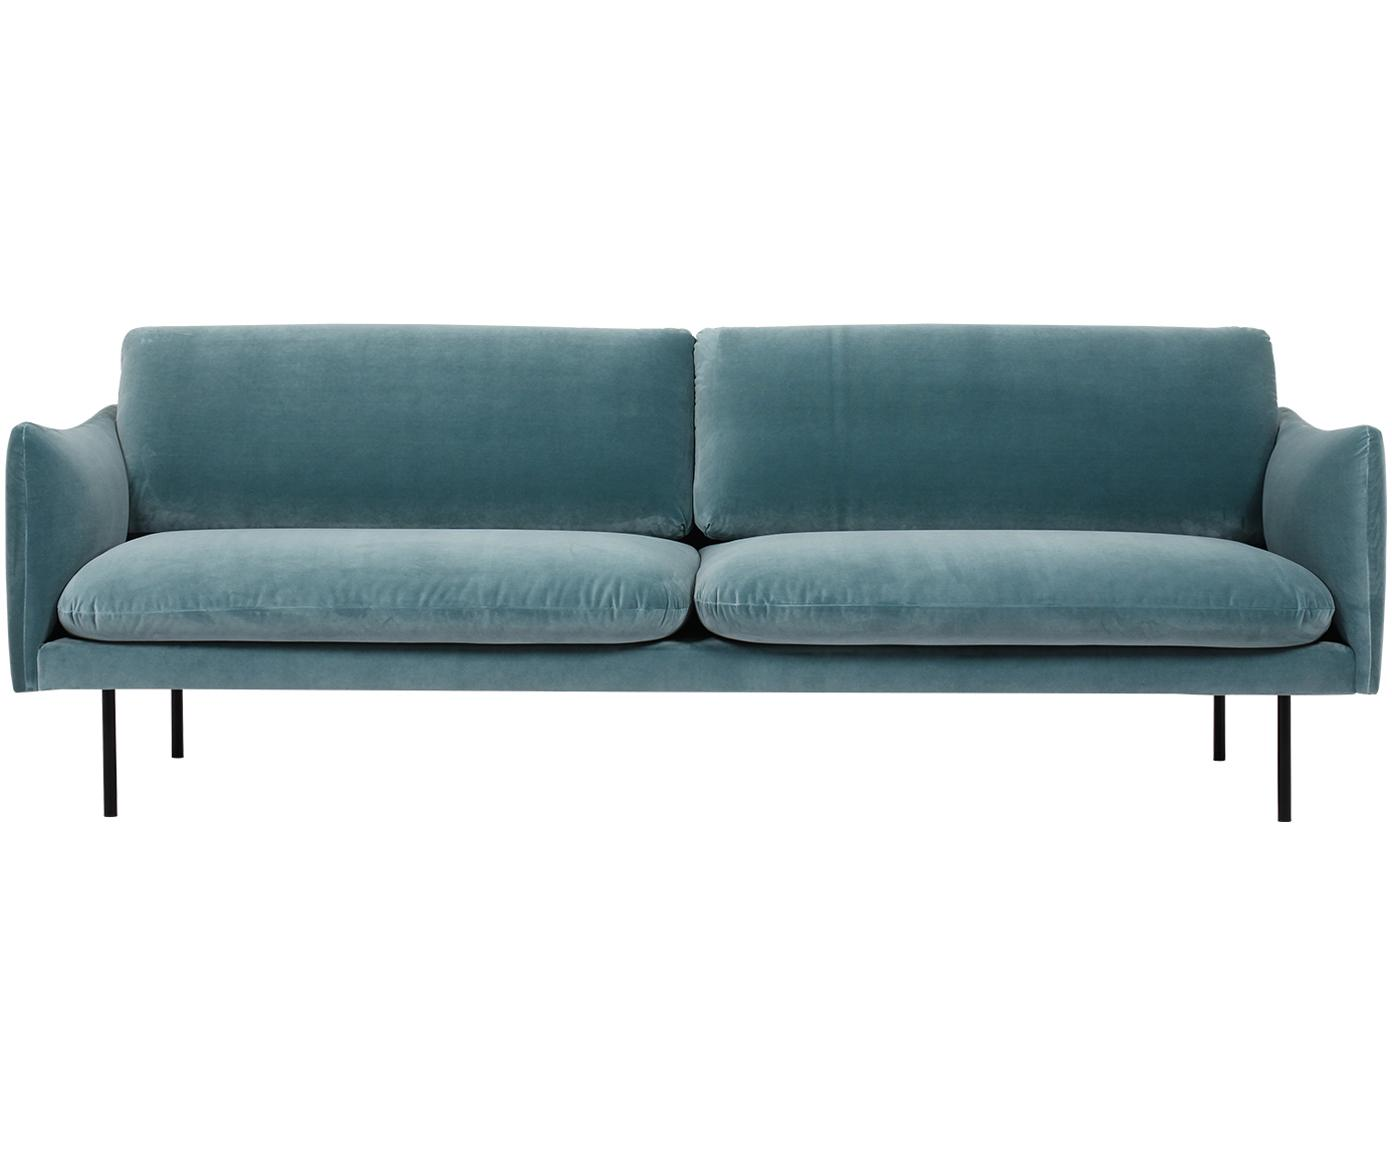 Samt-Sofa Moby (3-Sitzer), Bezug: Samt (Hochwertiger Polyes, Gestell: Massives Kiefernholz, Samt Türkis, B 220 x T 95 cm